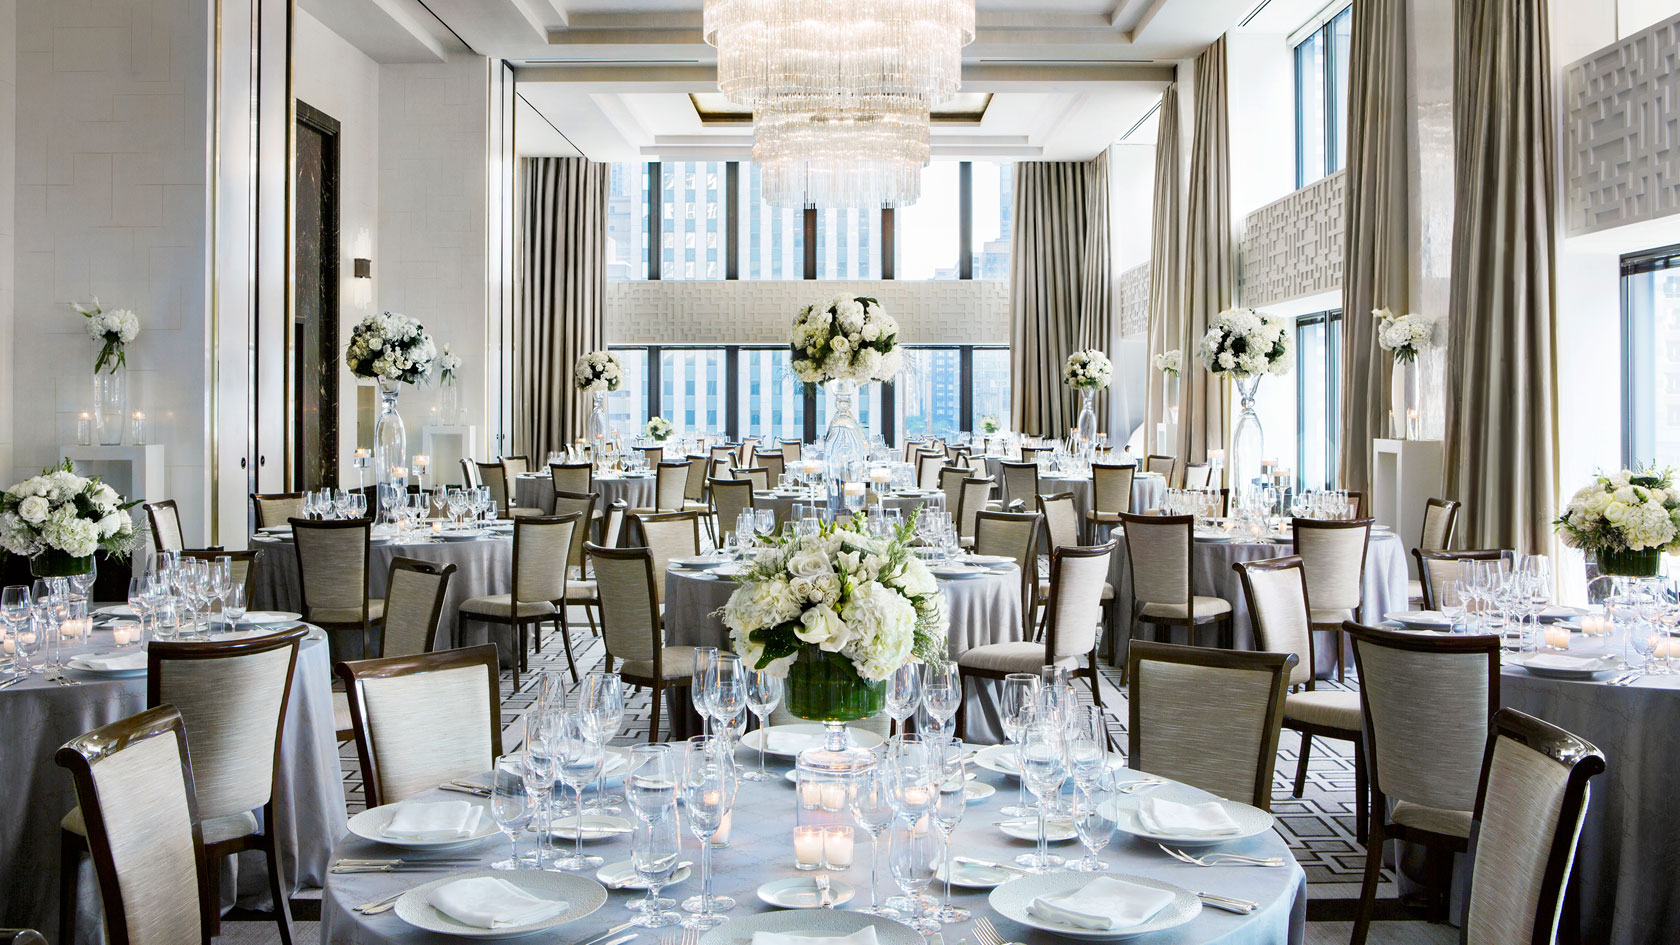 tlchi-events-devonshire-ballroom-wedding-1680-945